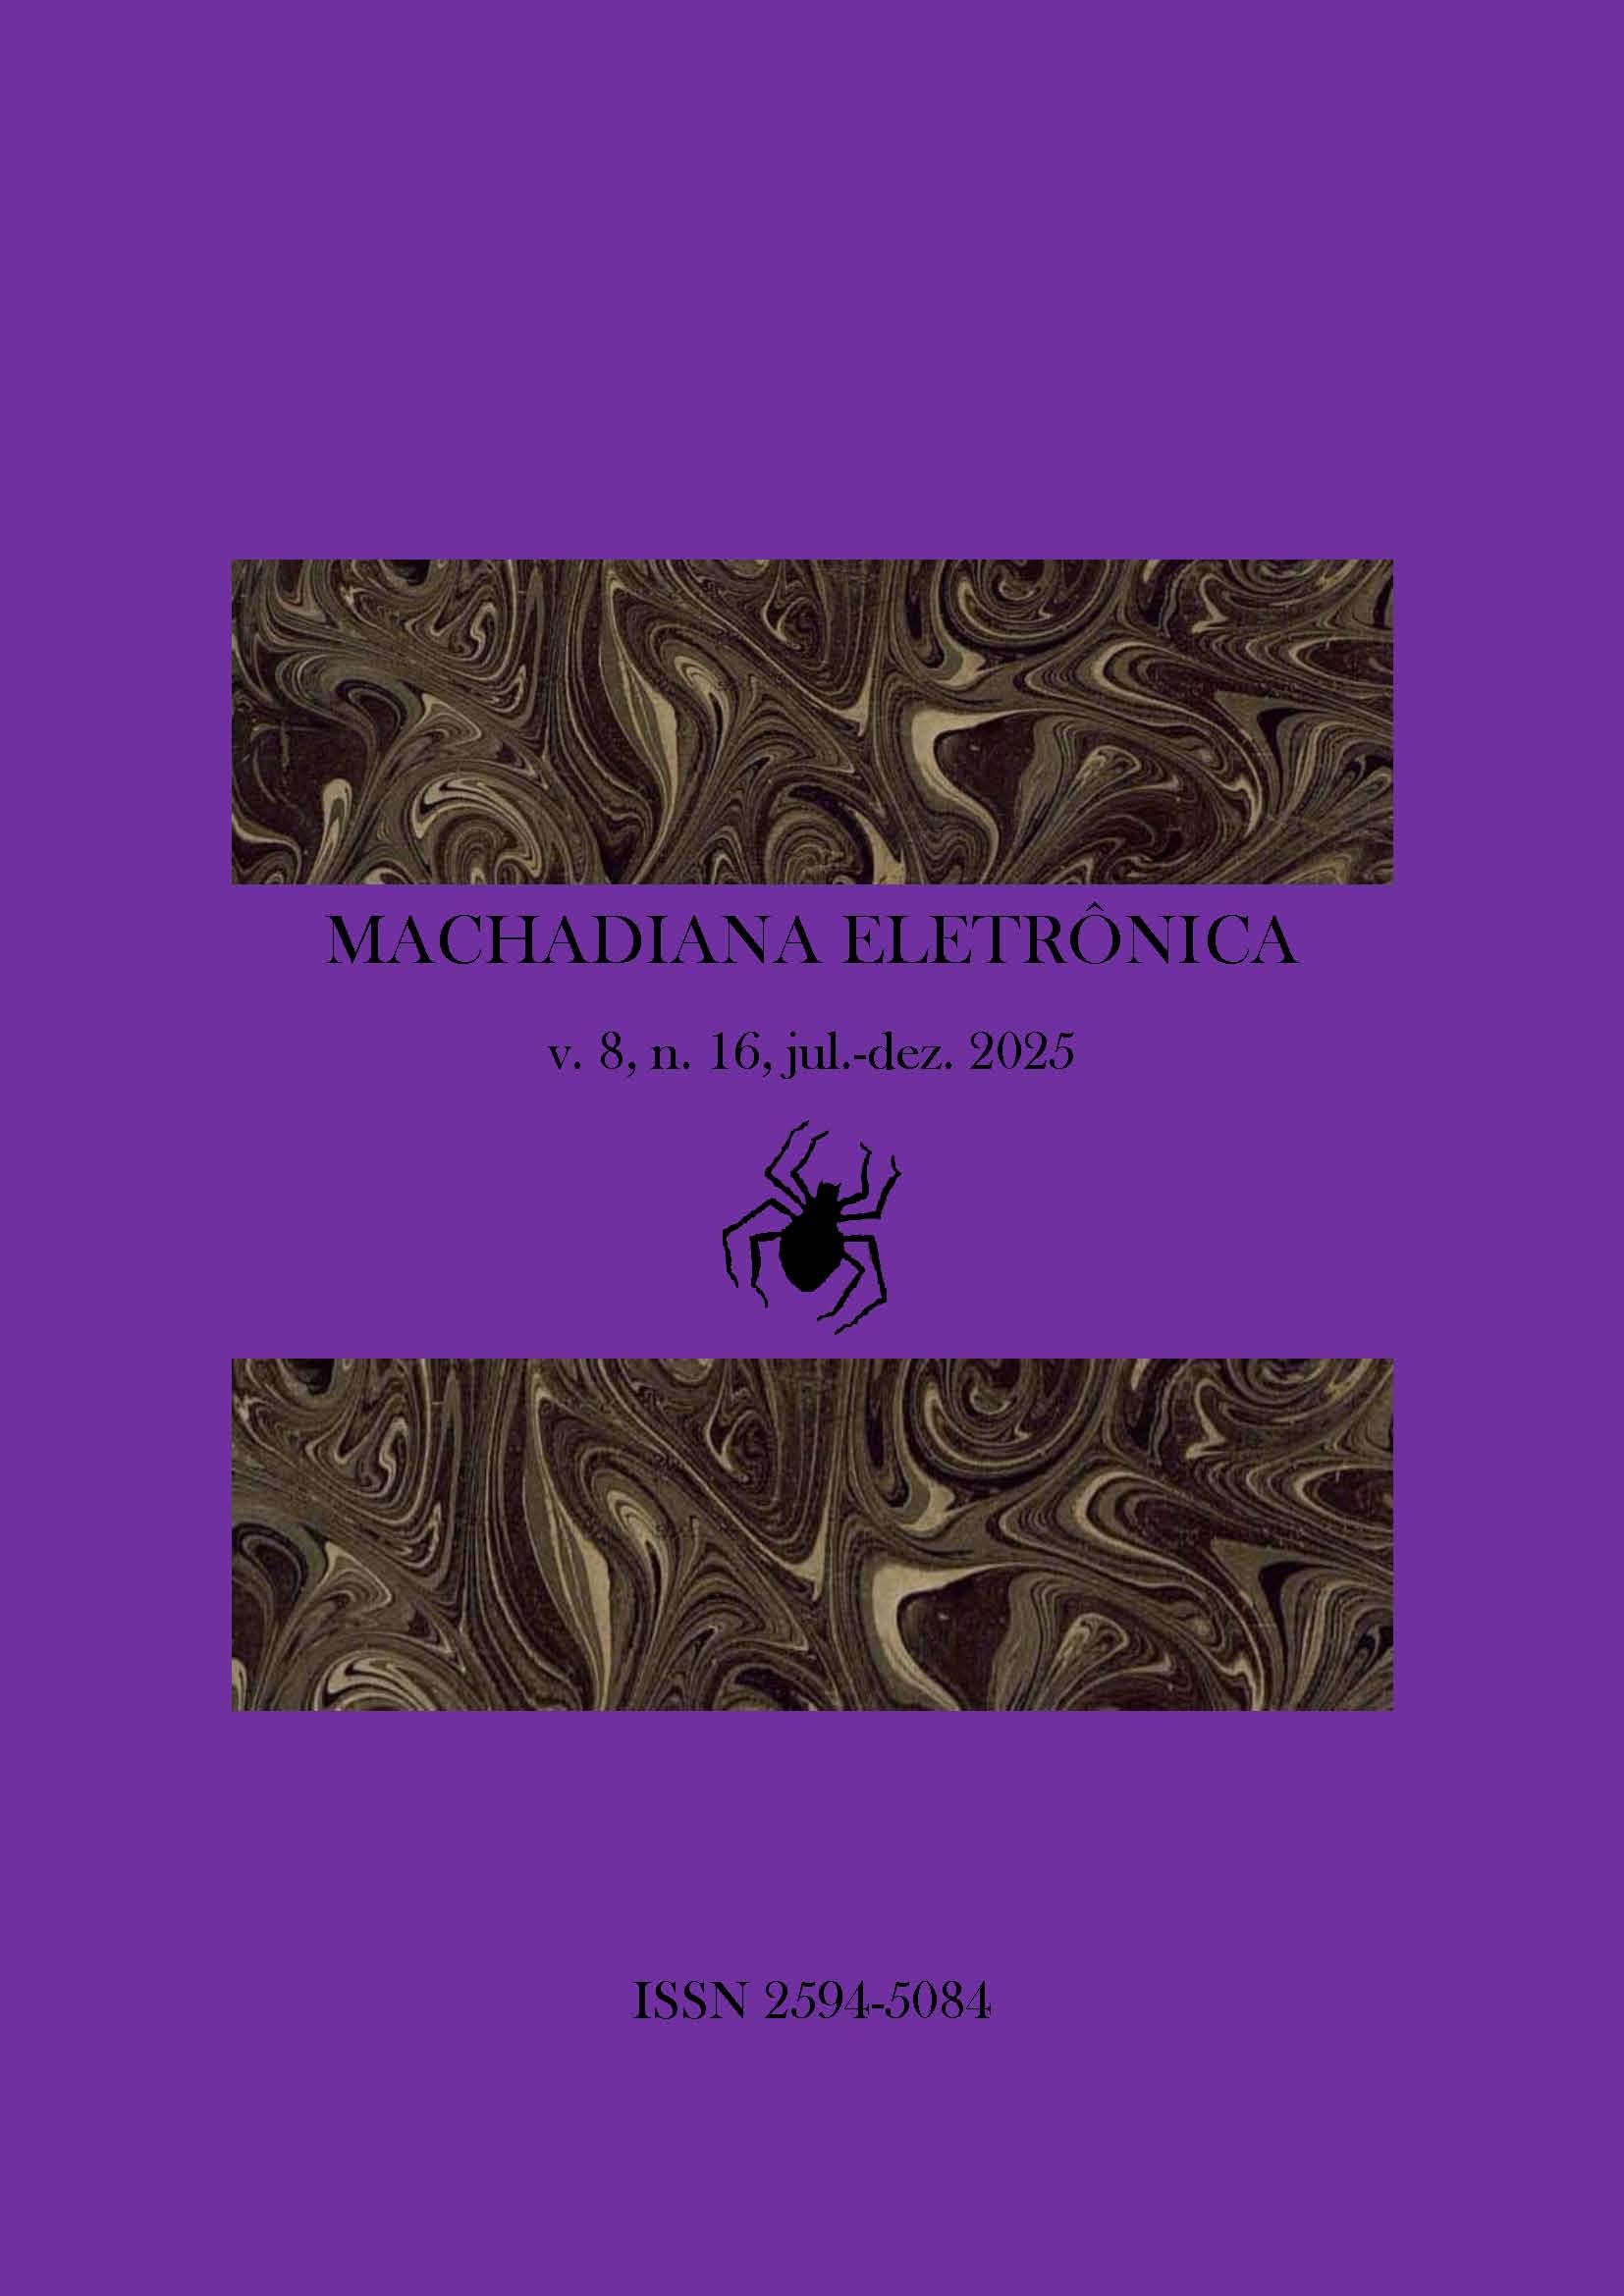 Visualizar v. 8 n. 16 (2025): Machadiana Eletrônica (Ahead of Print)